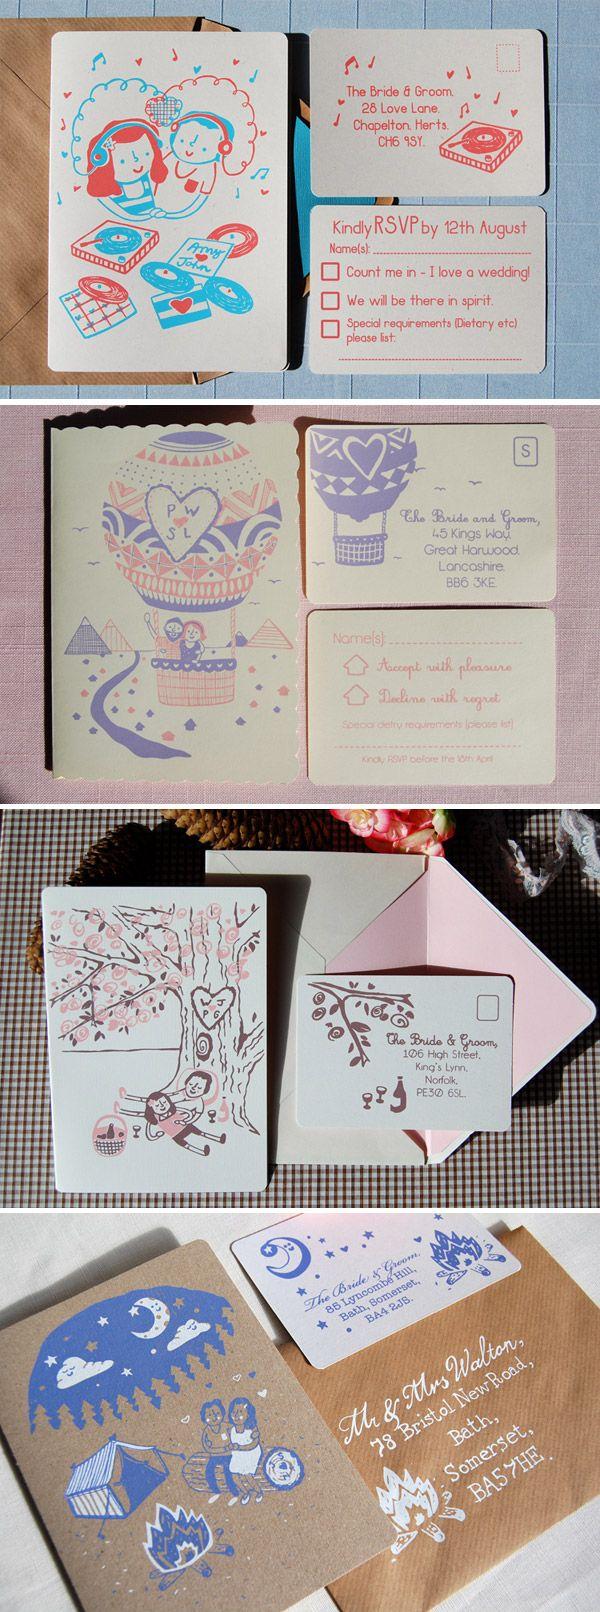 screen printed wedding invites - good alternative to letter press